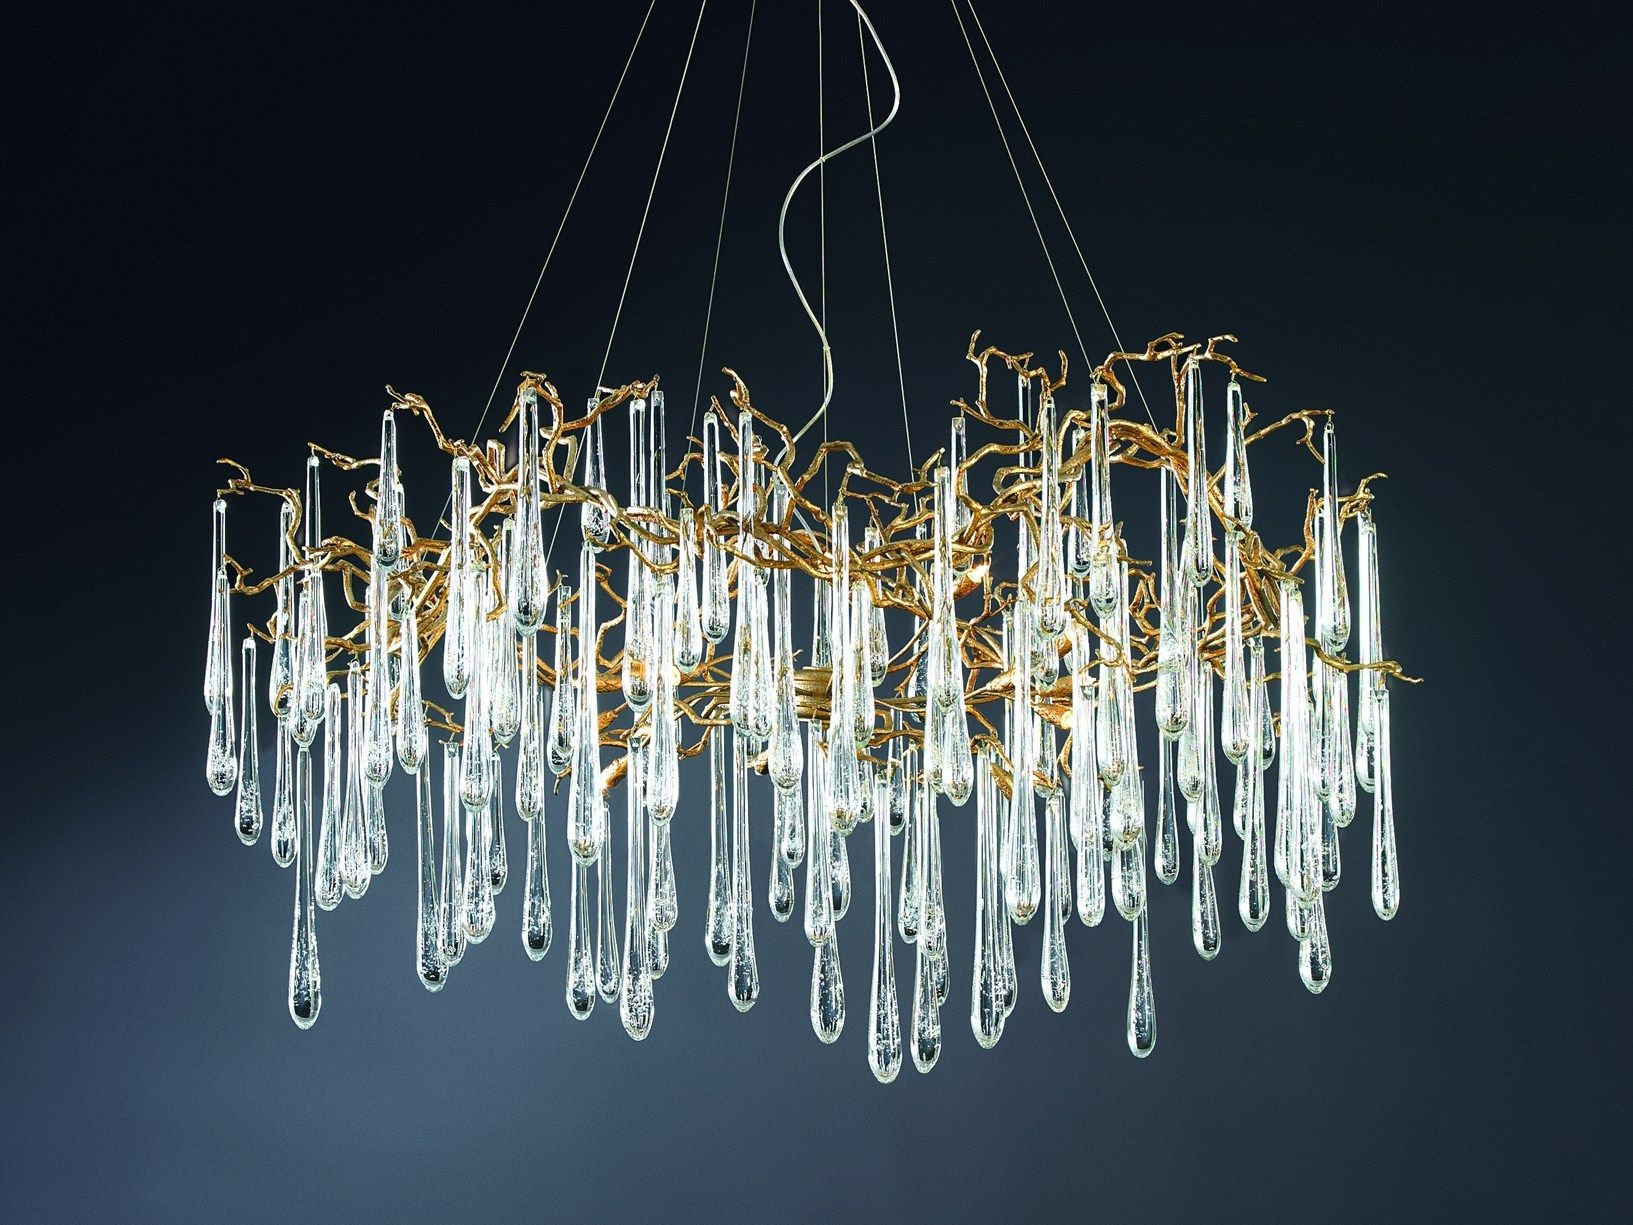 Serip organic lighting chandeliers inspired by nature arubaitofo Images